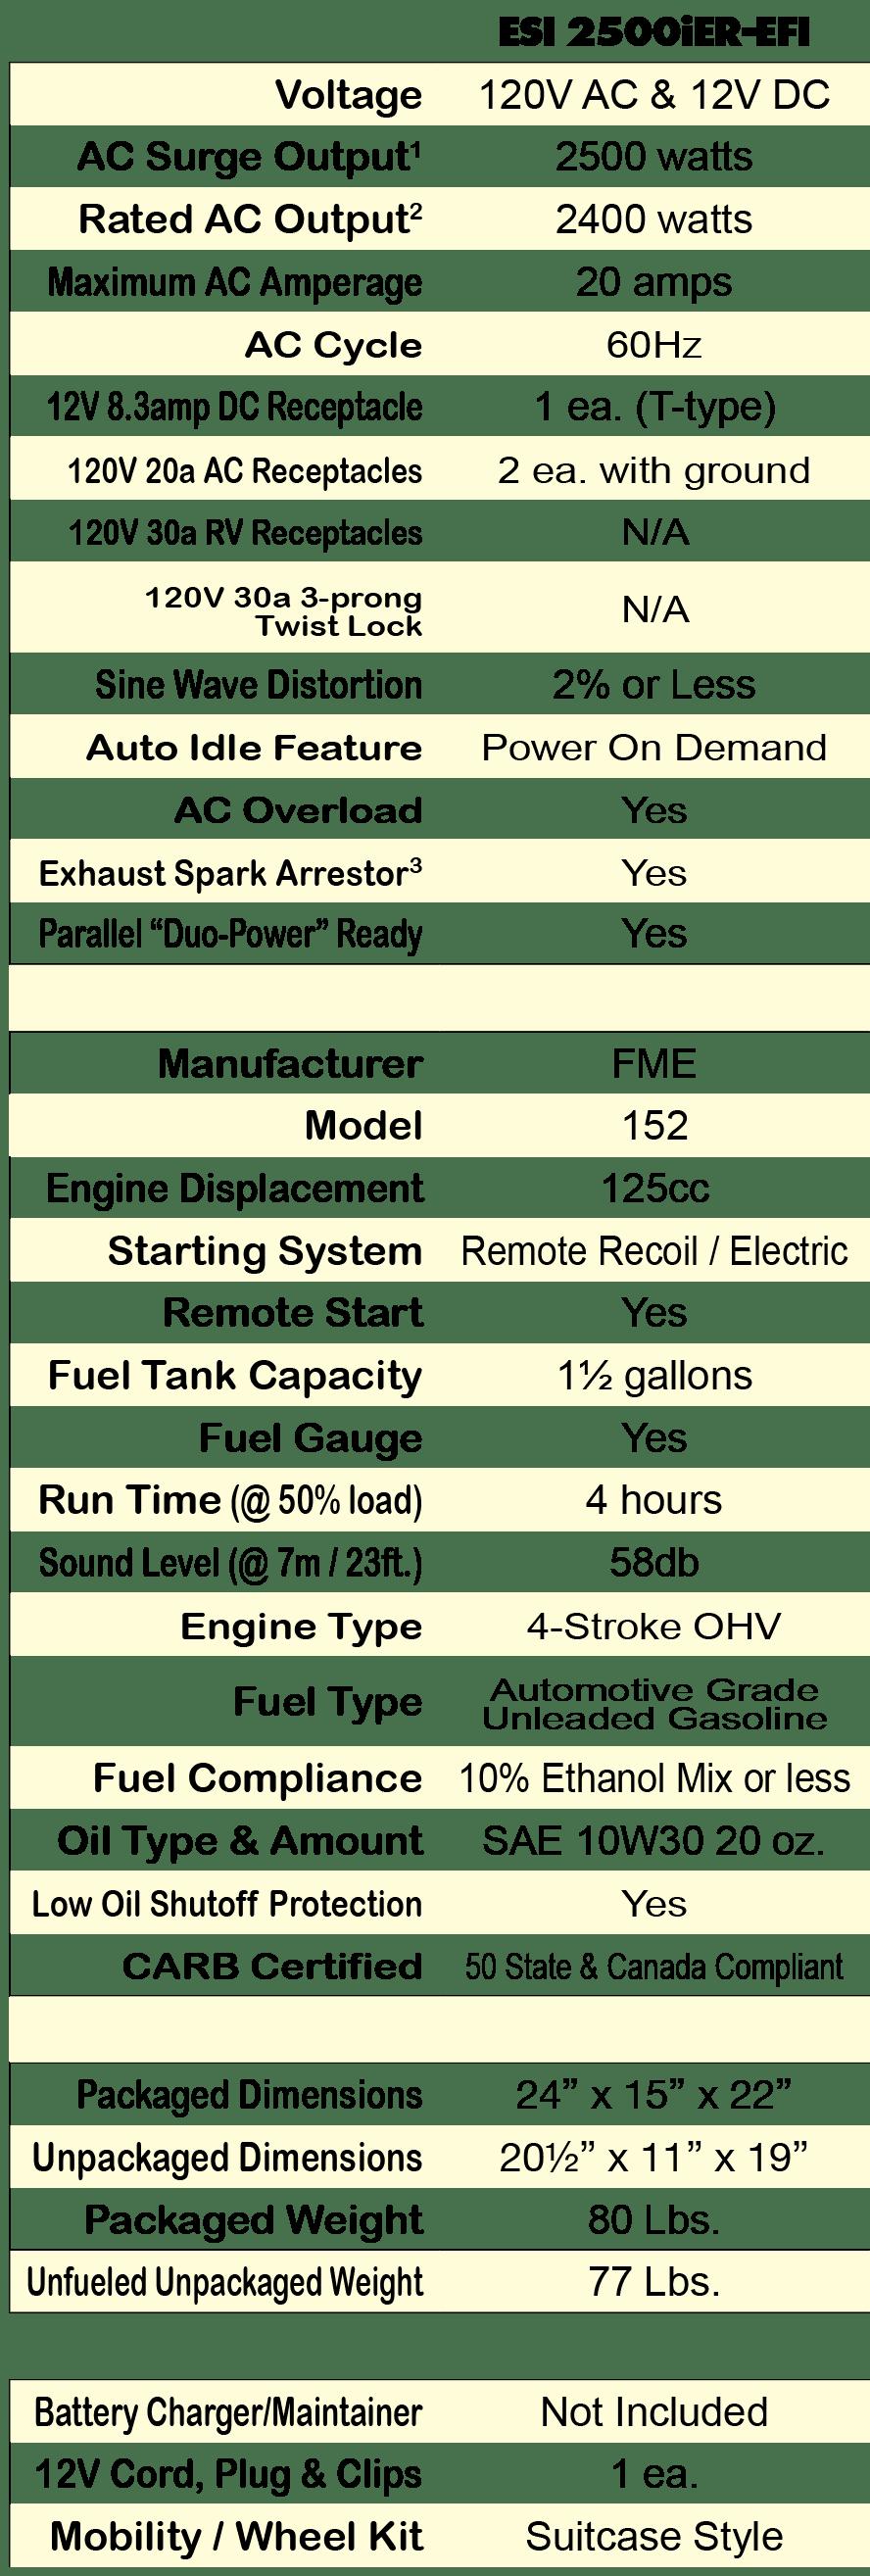 ESI2500iER-EFI